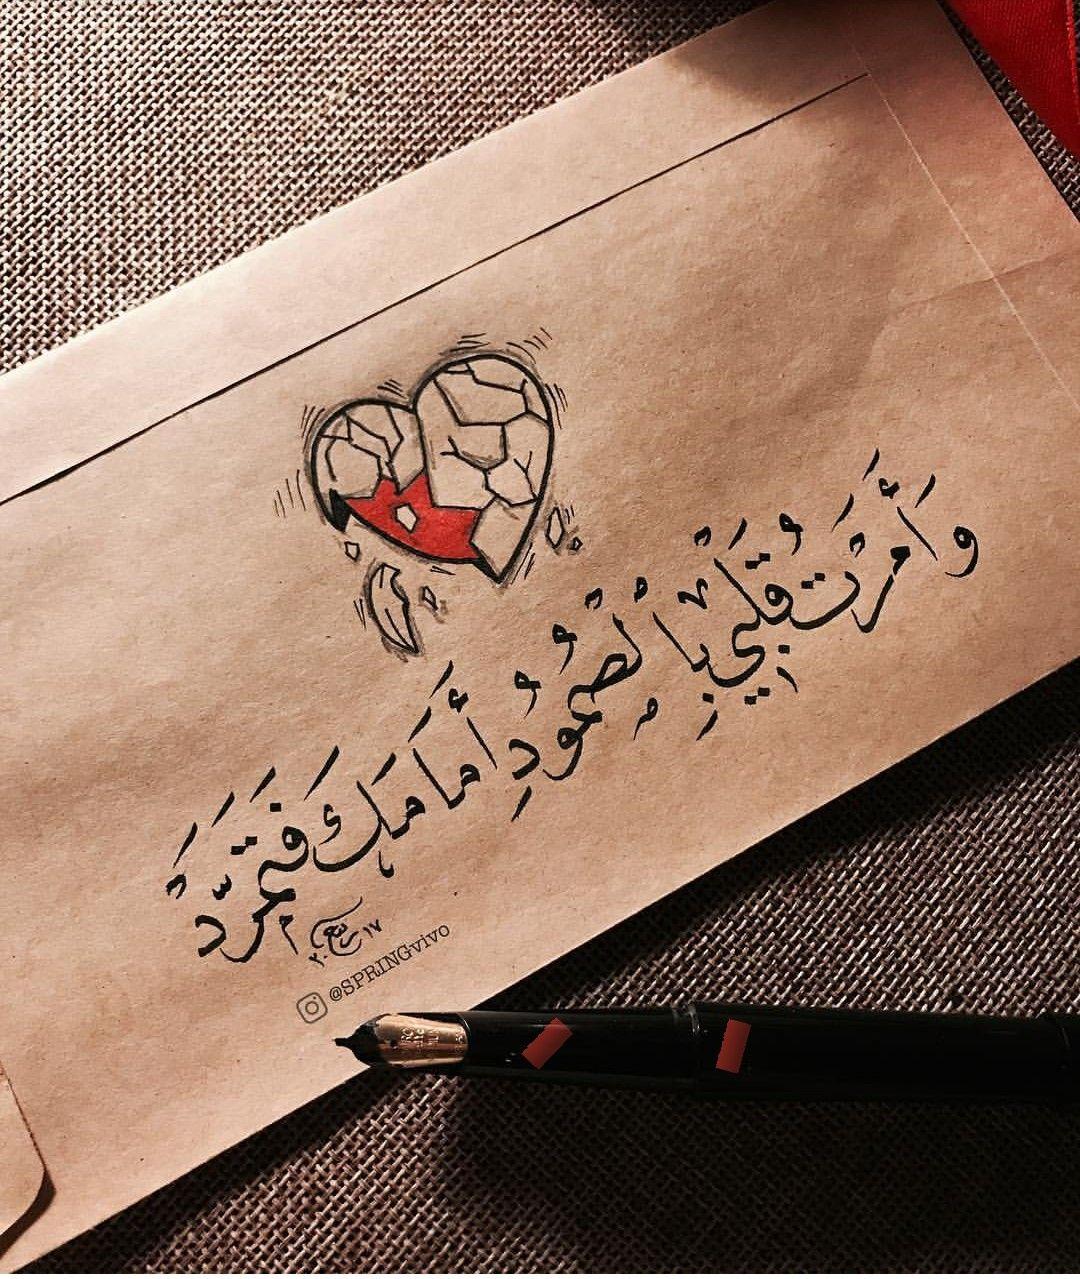 و أمرت قلبي بالصمود أمامك فتمرد Quotes For Book Lovers Arabic Love Quotes Morning Love Quotes